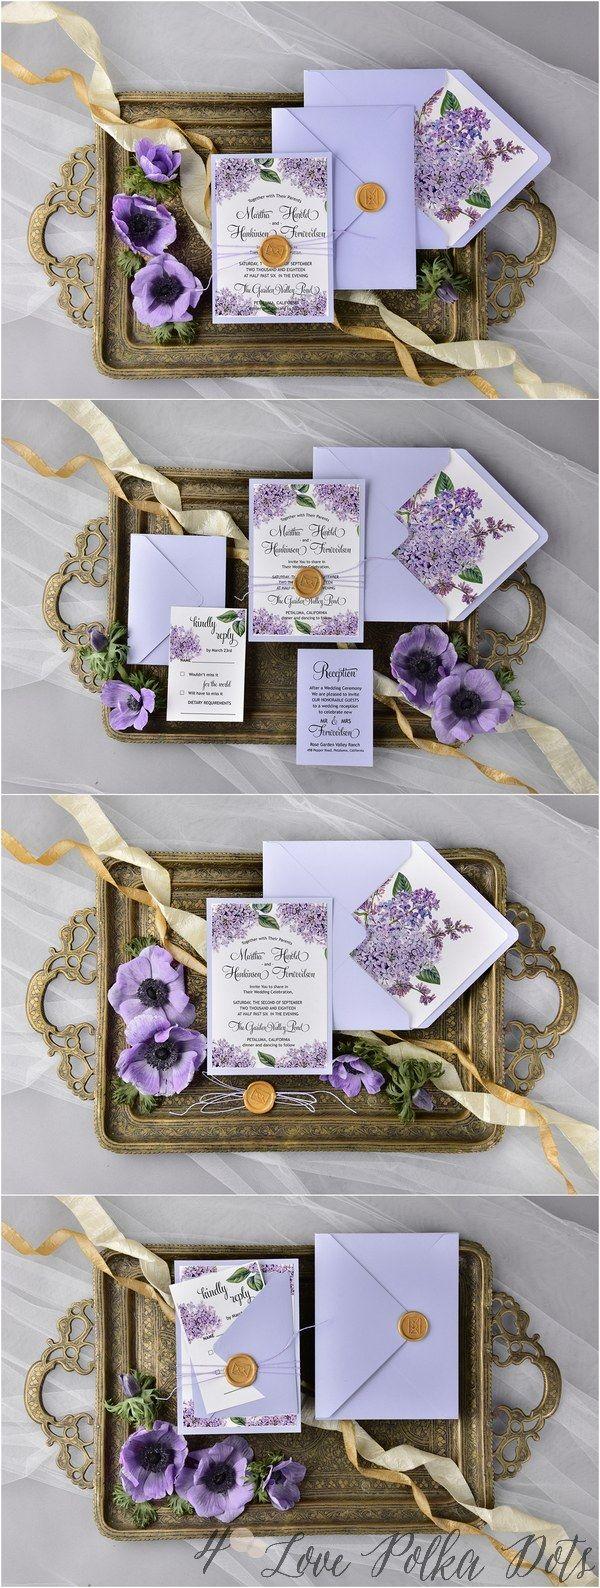 Purple hydrangea wedding invitation sample - Watercolor Passion Purple Hydrangea Wedding Invitations